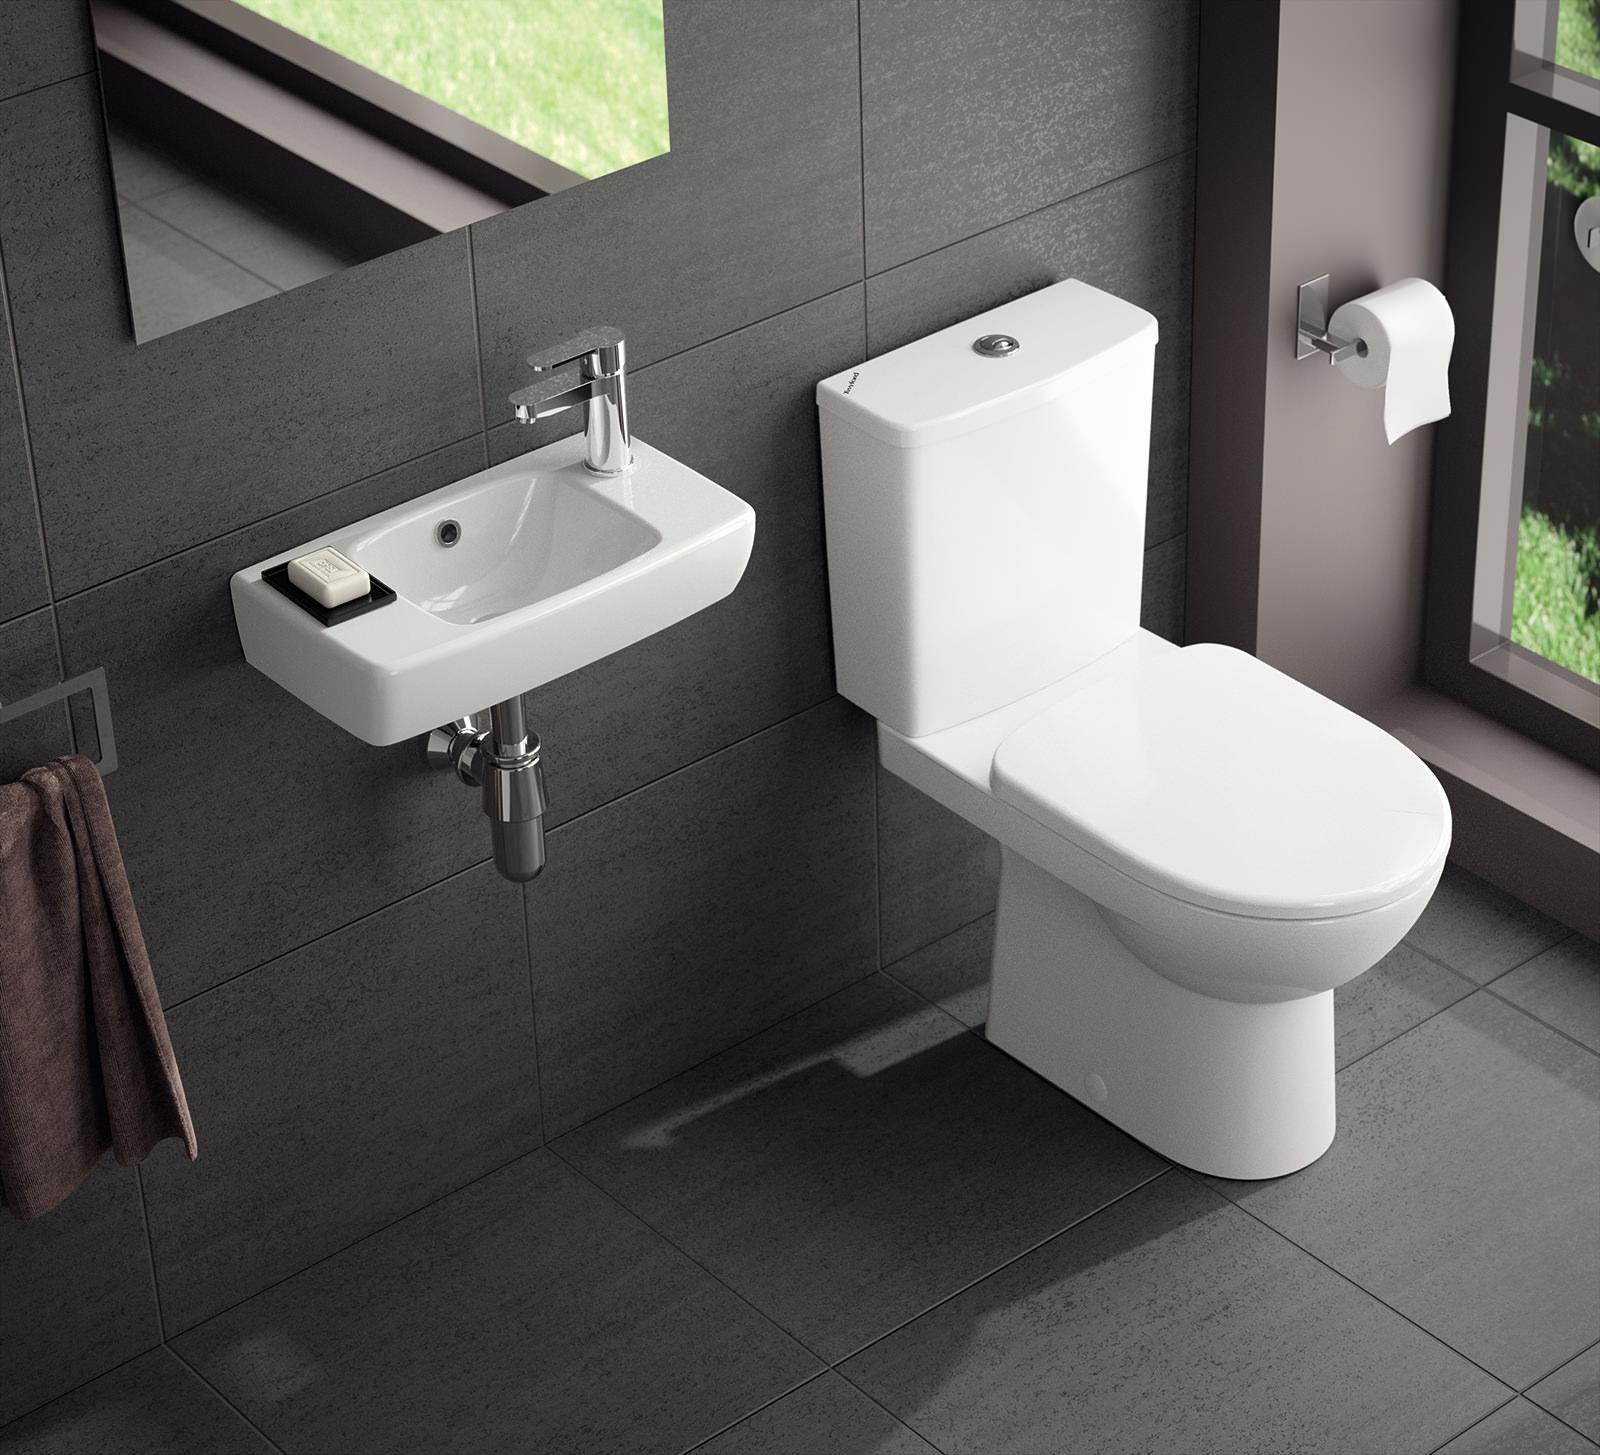 Popular 250mm 400mm Basin - AD_AQ-40394_Twyford-E100-Square-1-Right-Hand-Tap-Hole-450-x-250mm-Handrinse-Basin1816  HD_343818.jpg